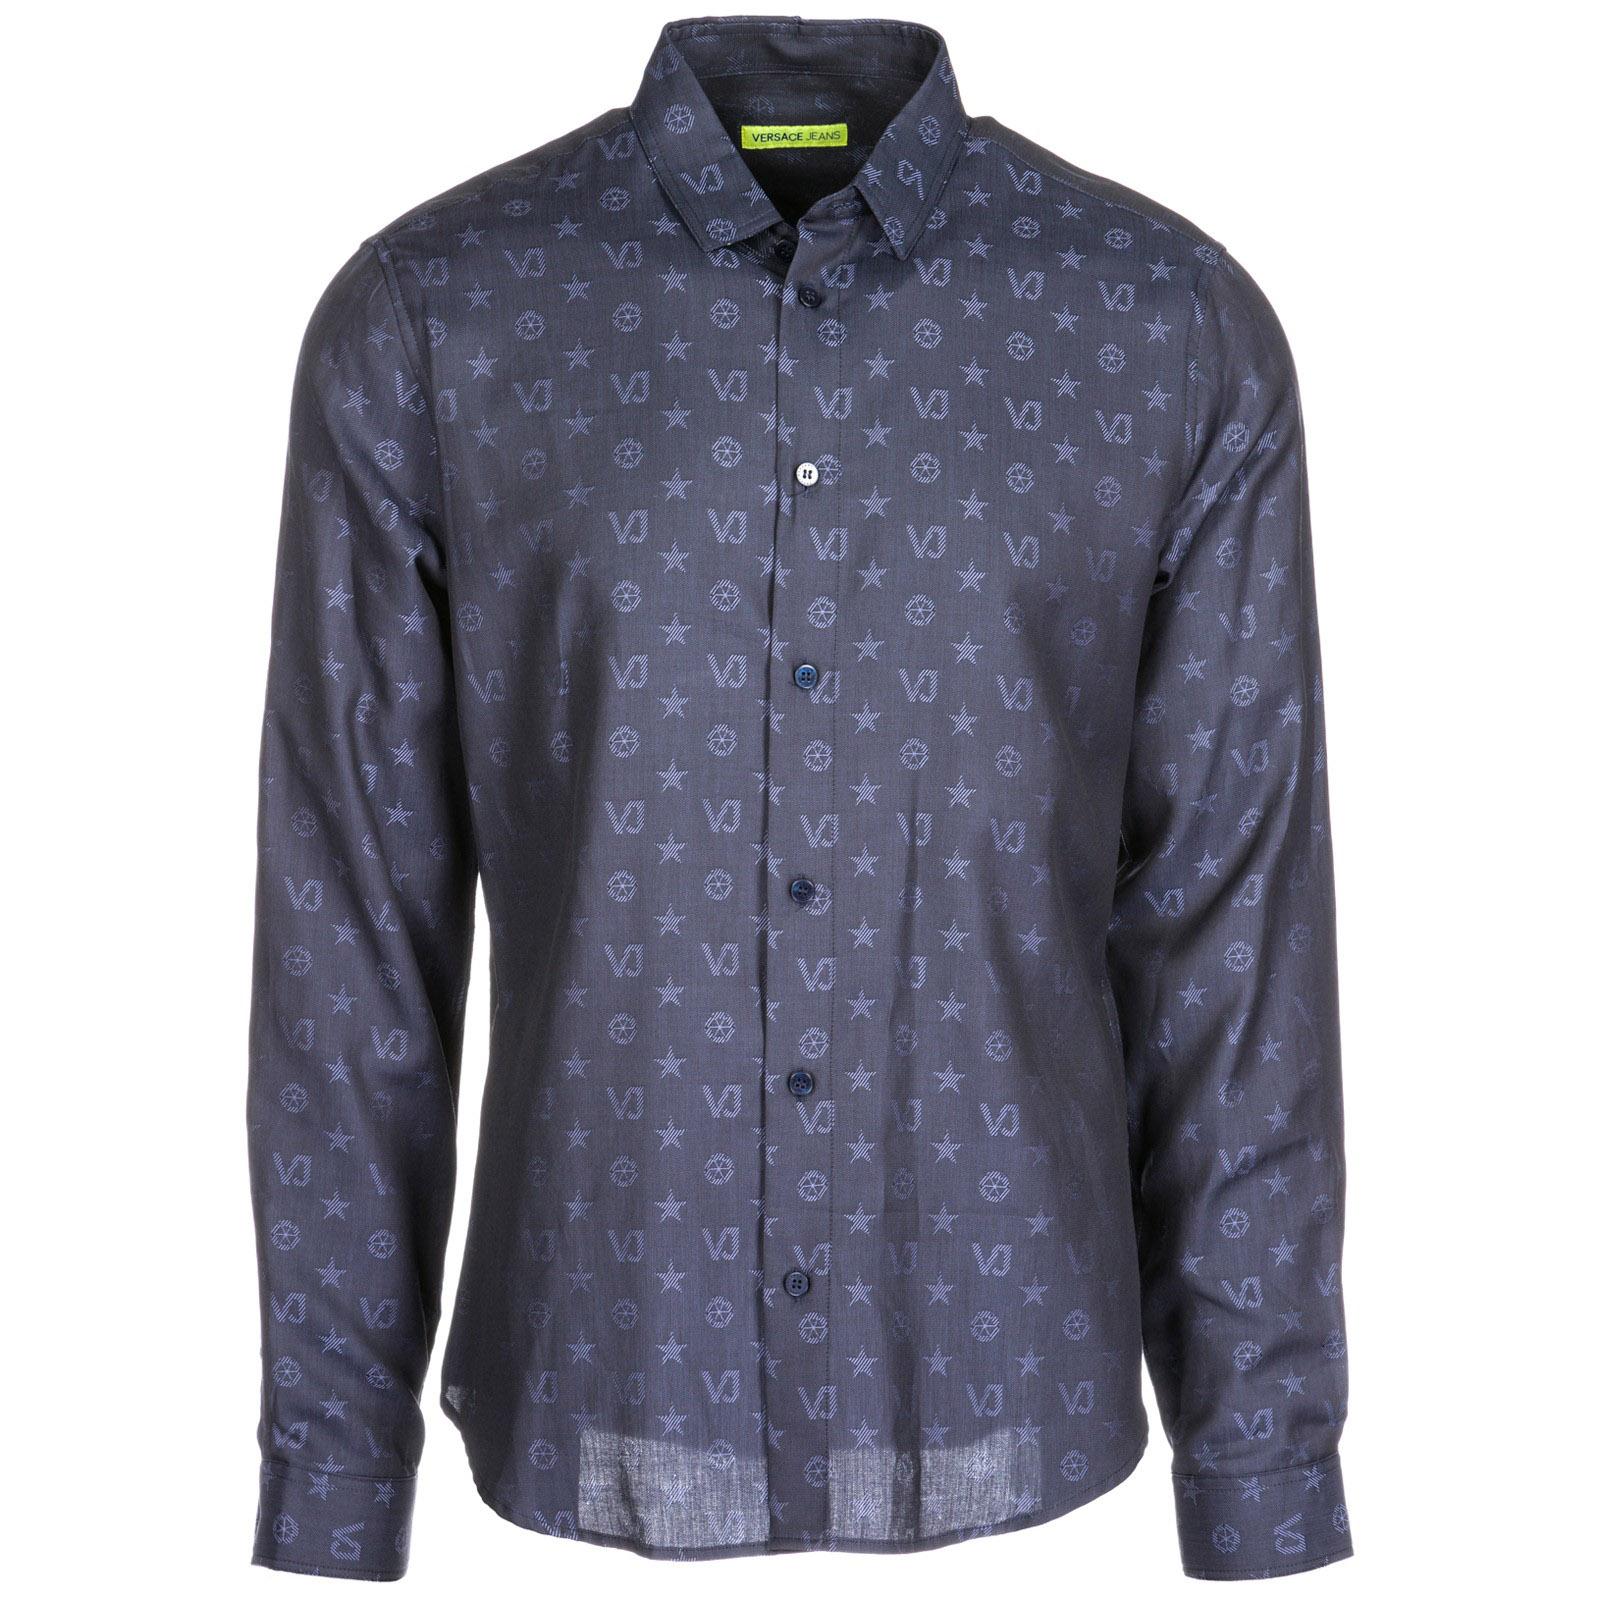 ab434a81198 Chemise Versace Jeans B1GSA6S0 08787 blu